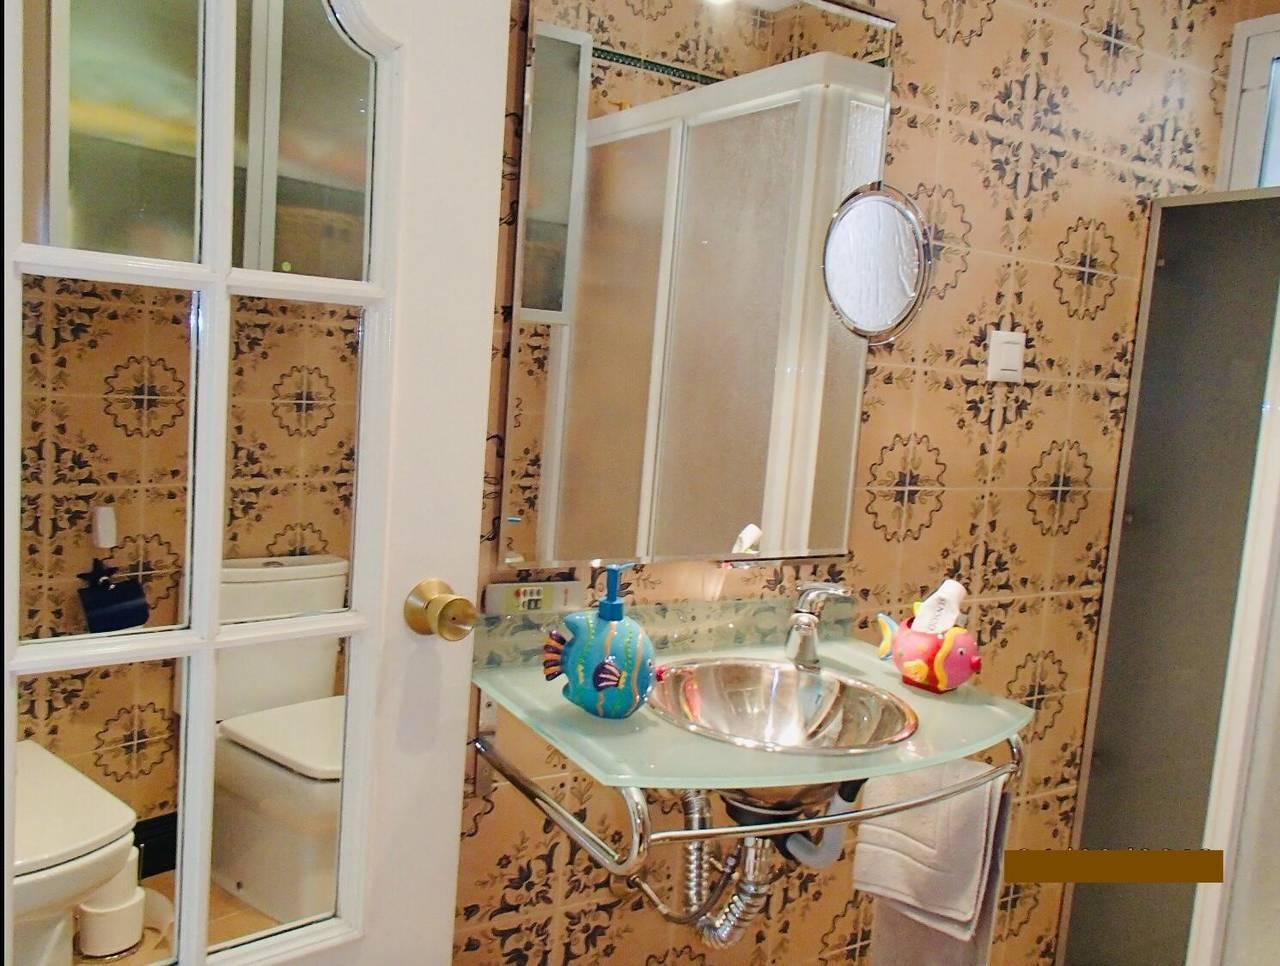 Particular alquila/vende preciosa casa adosada esquinera Coria del Rio  - Foto 7